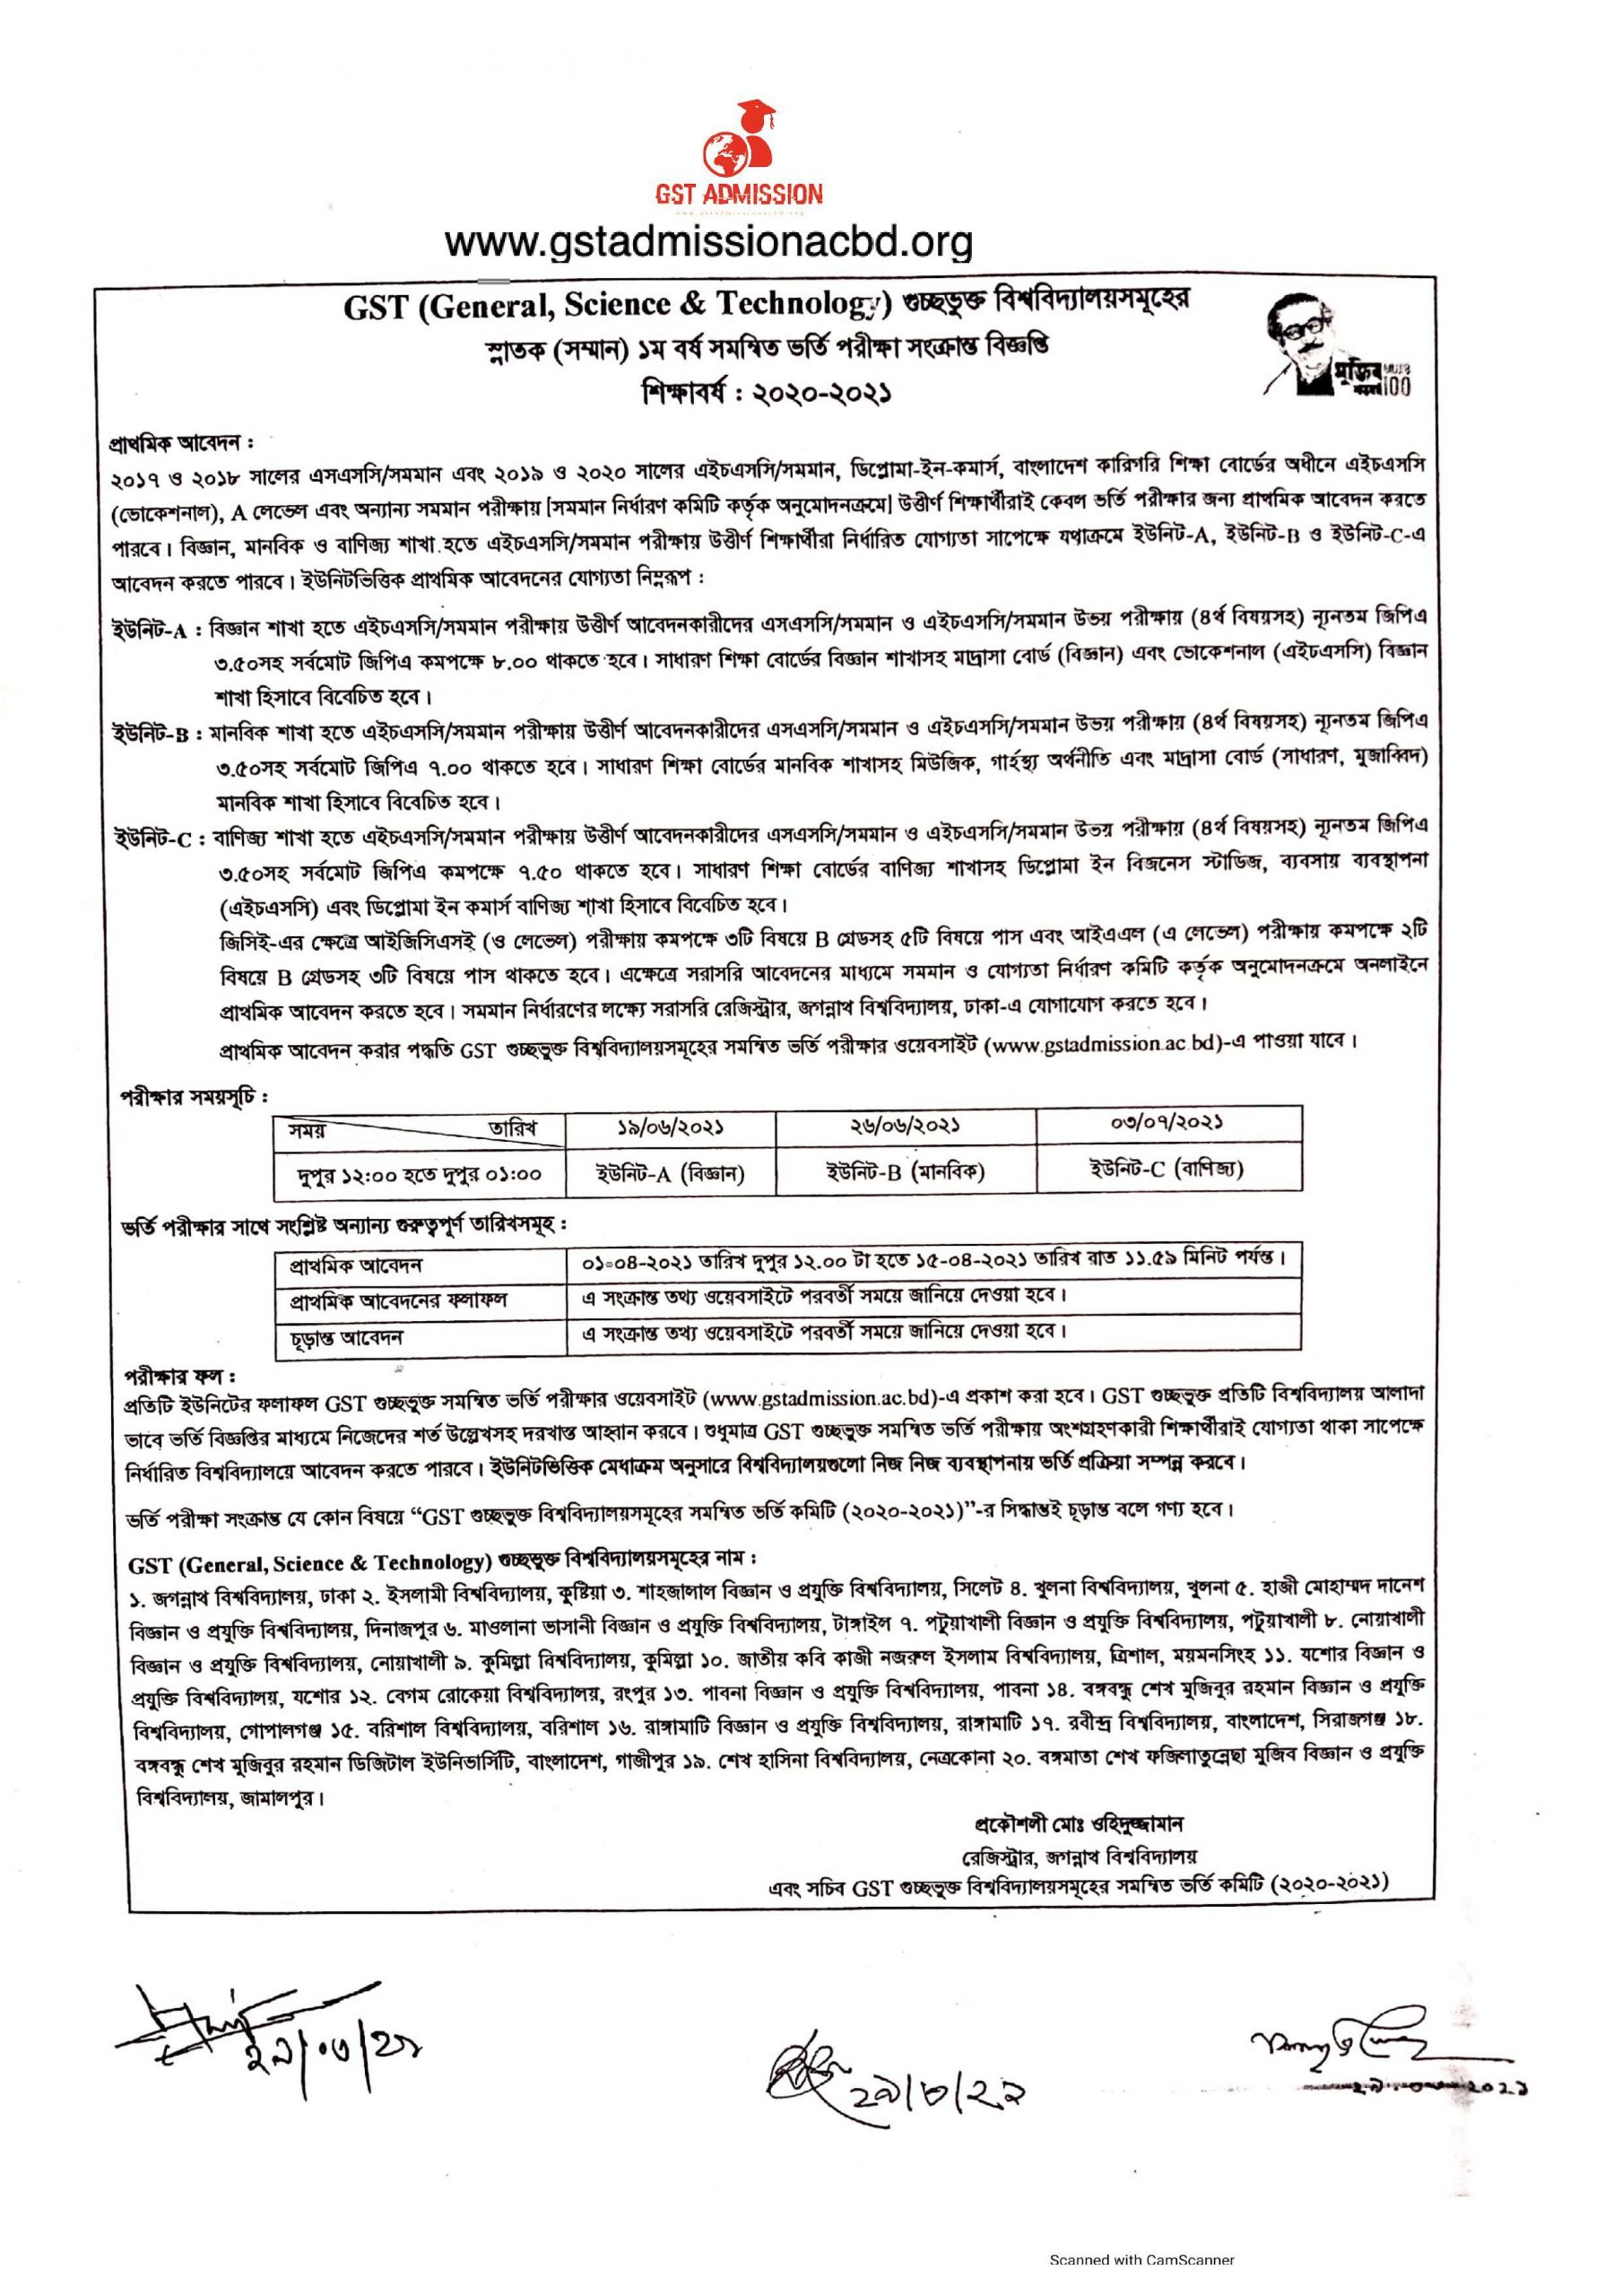 GST Jagannath University Admission Circular 2021